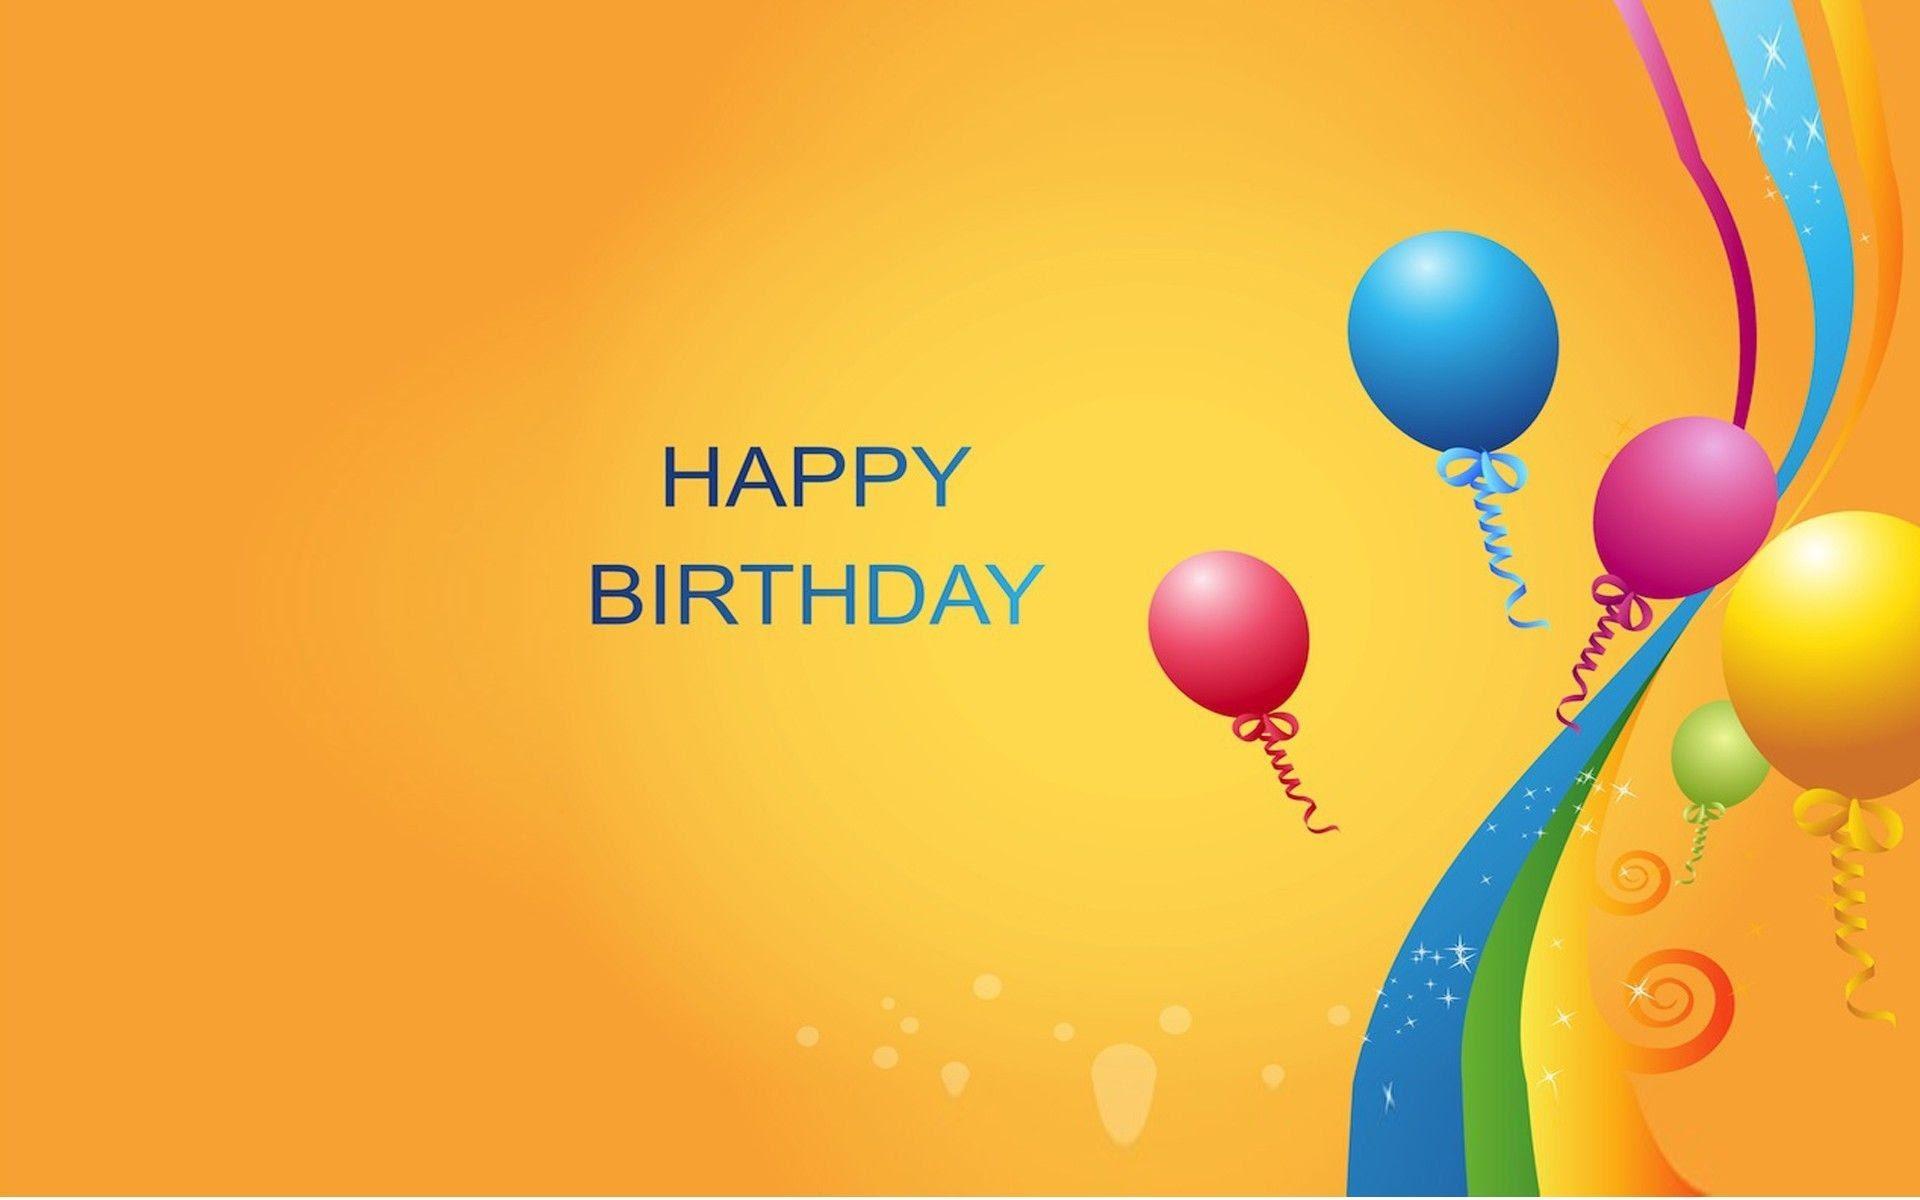 Birthday Desktop Backgrounds 50 Images